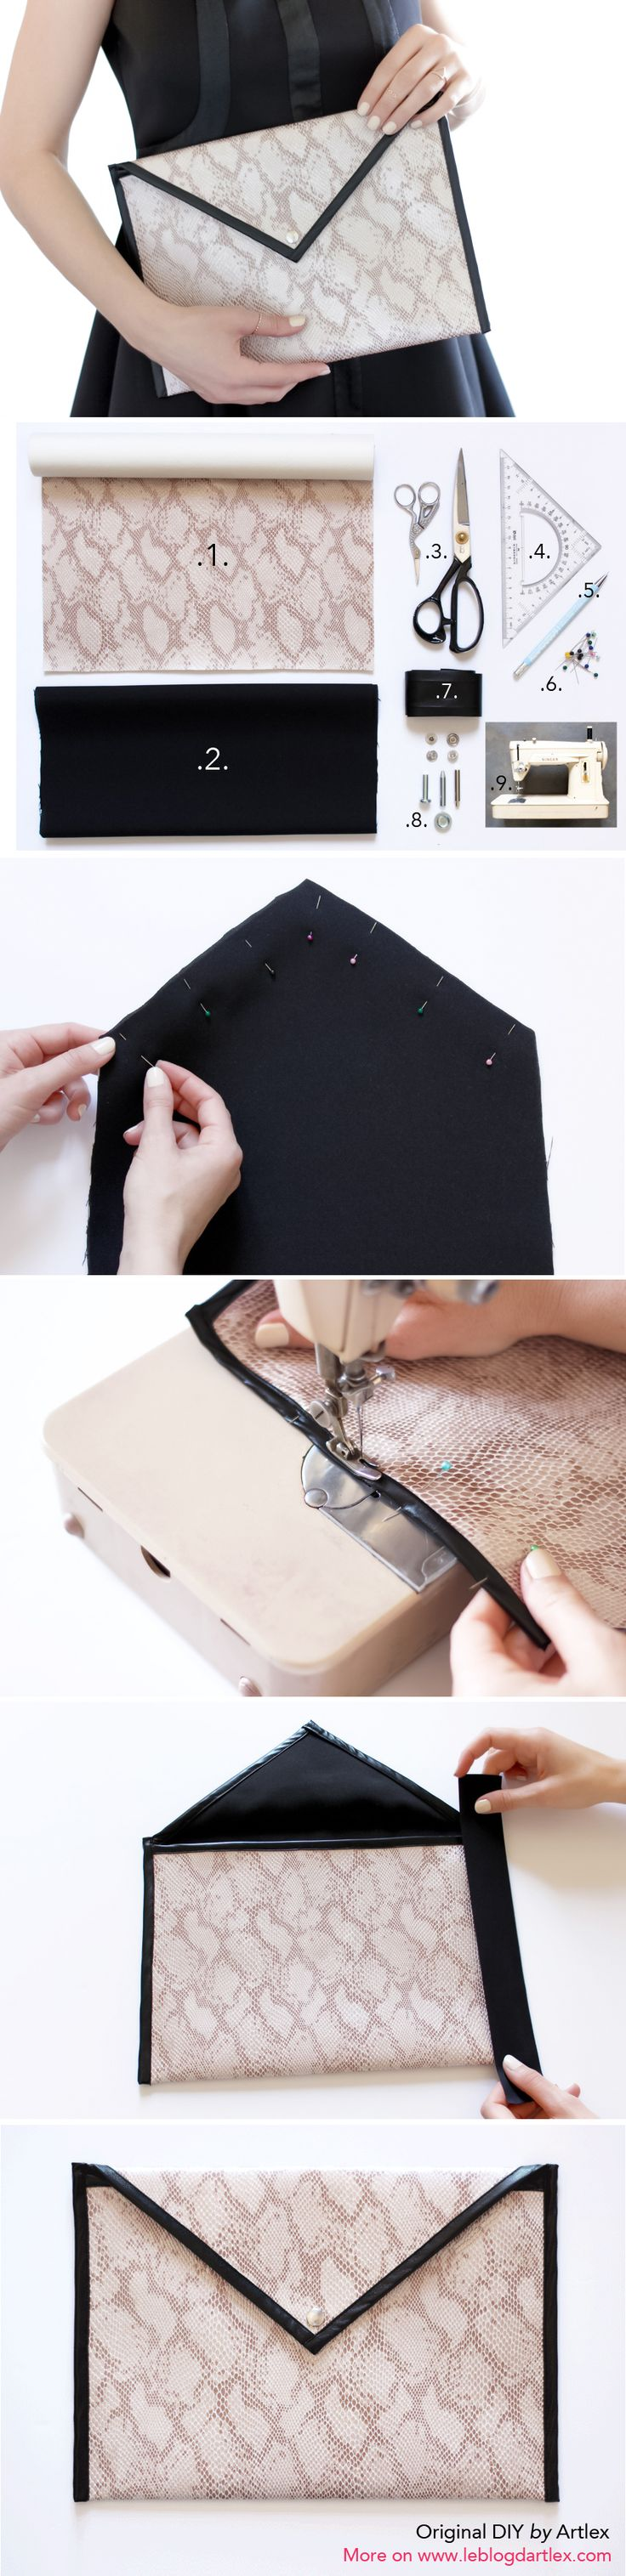 DIY pochette enveloppe / DIY pochette cuir - Blog mode & DIY Artlex…